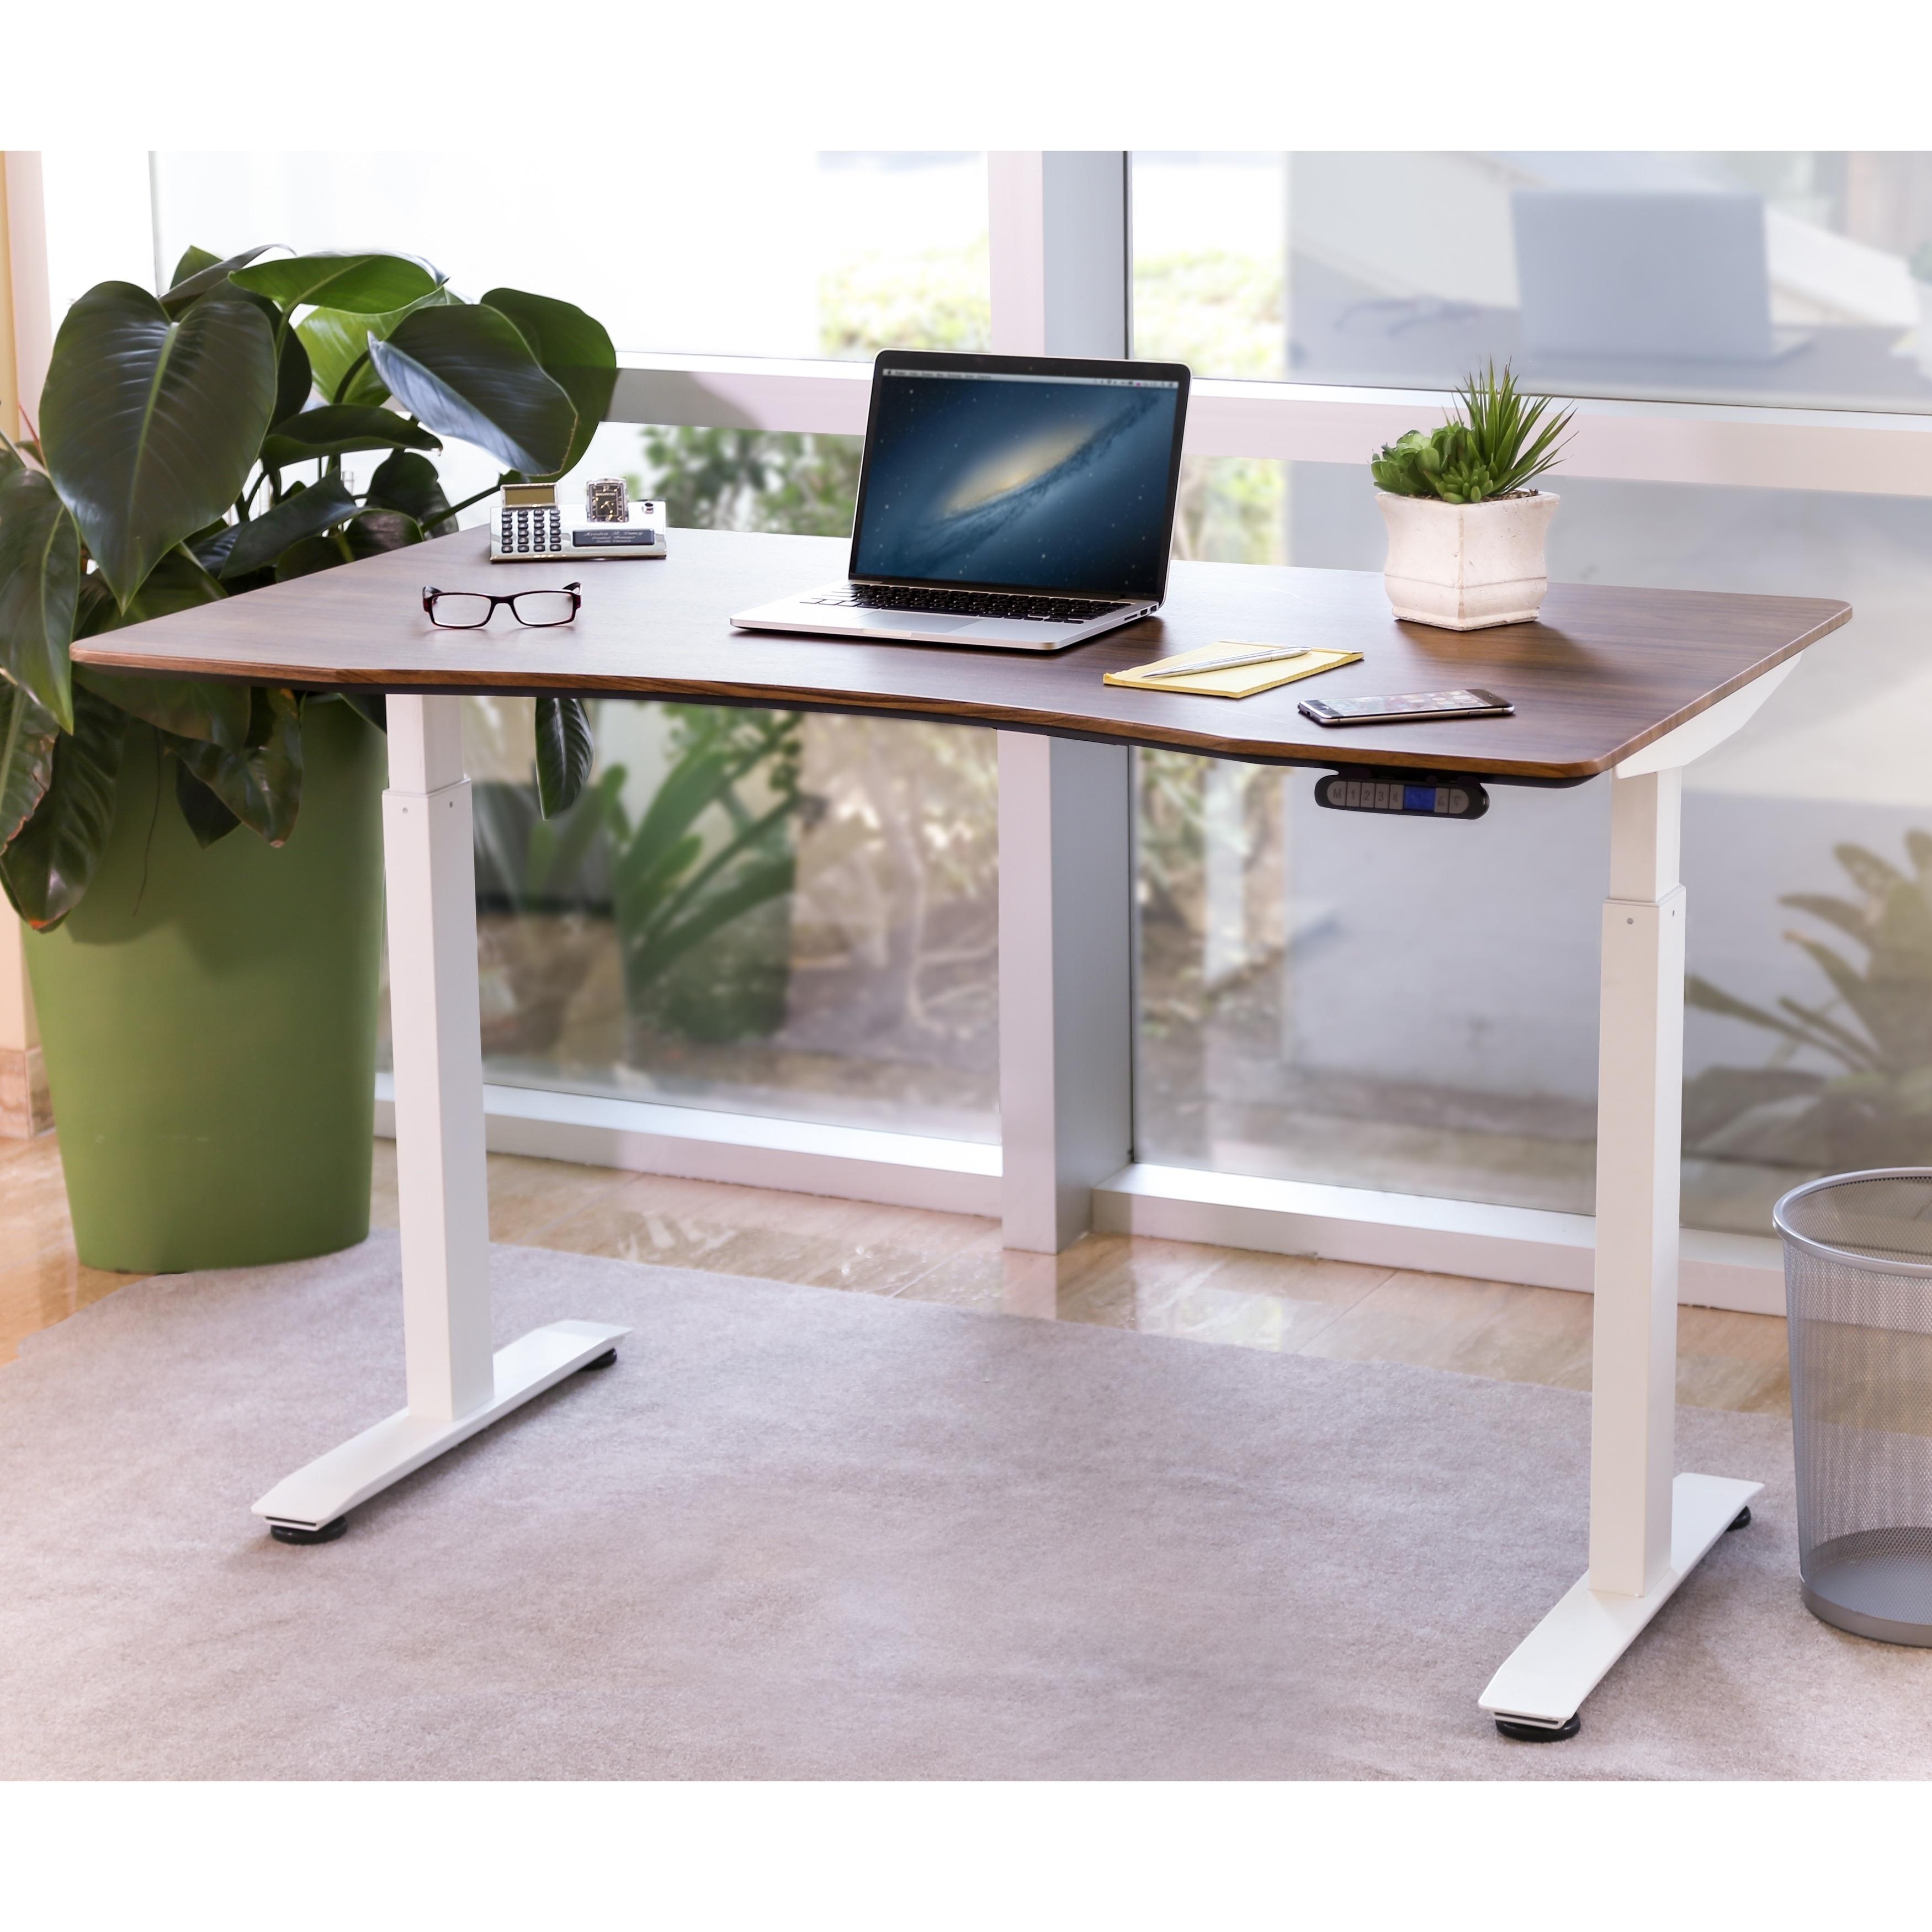 standing solution desktop height ergo desk adjustable ergonomic kangaroo from